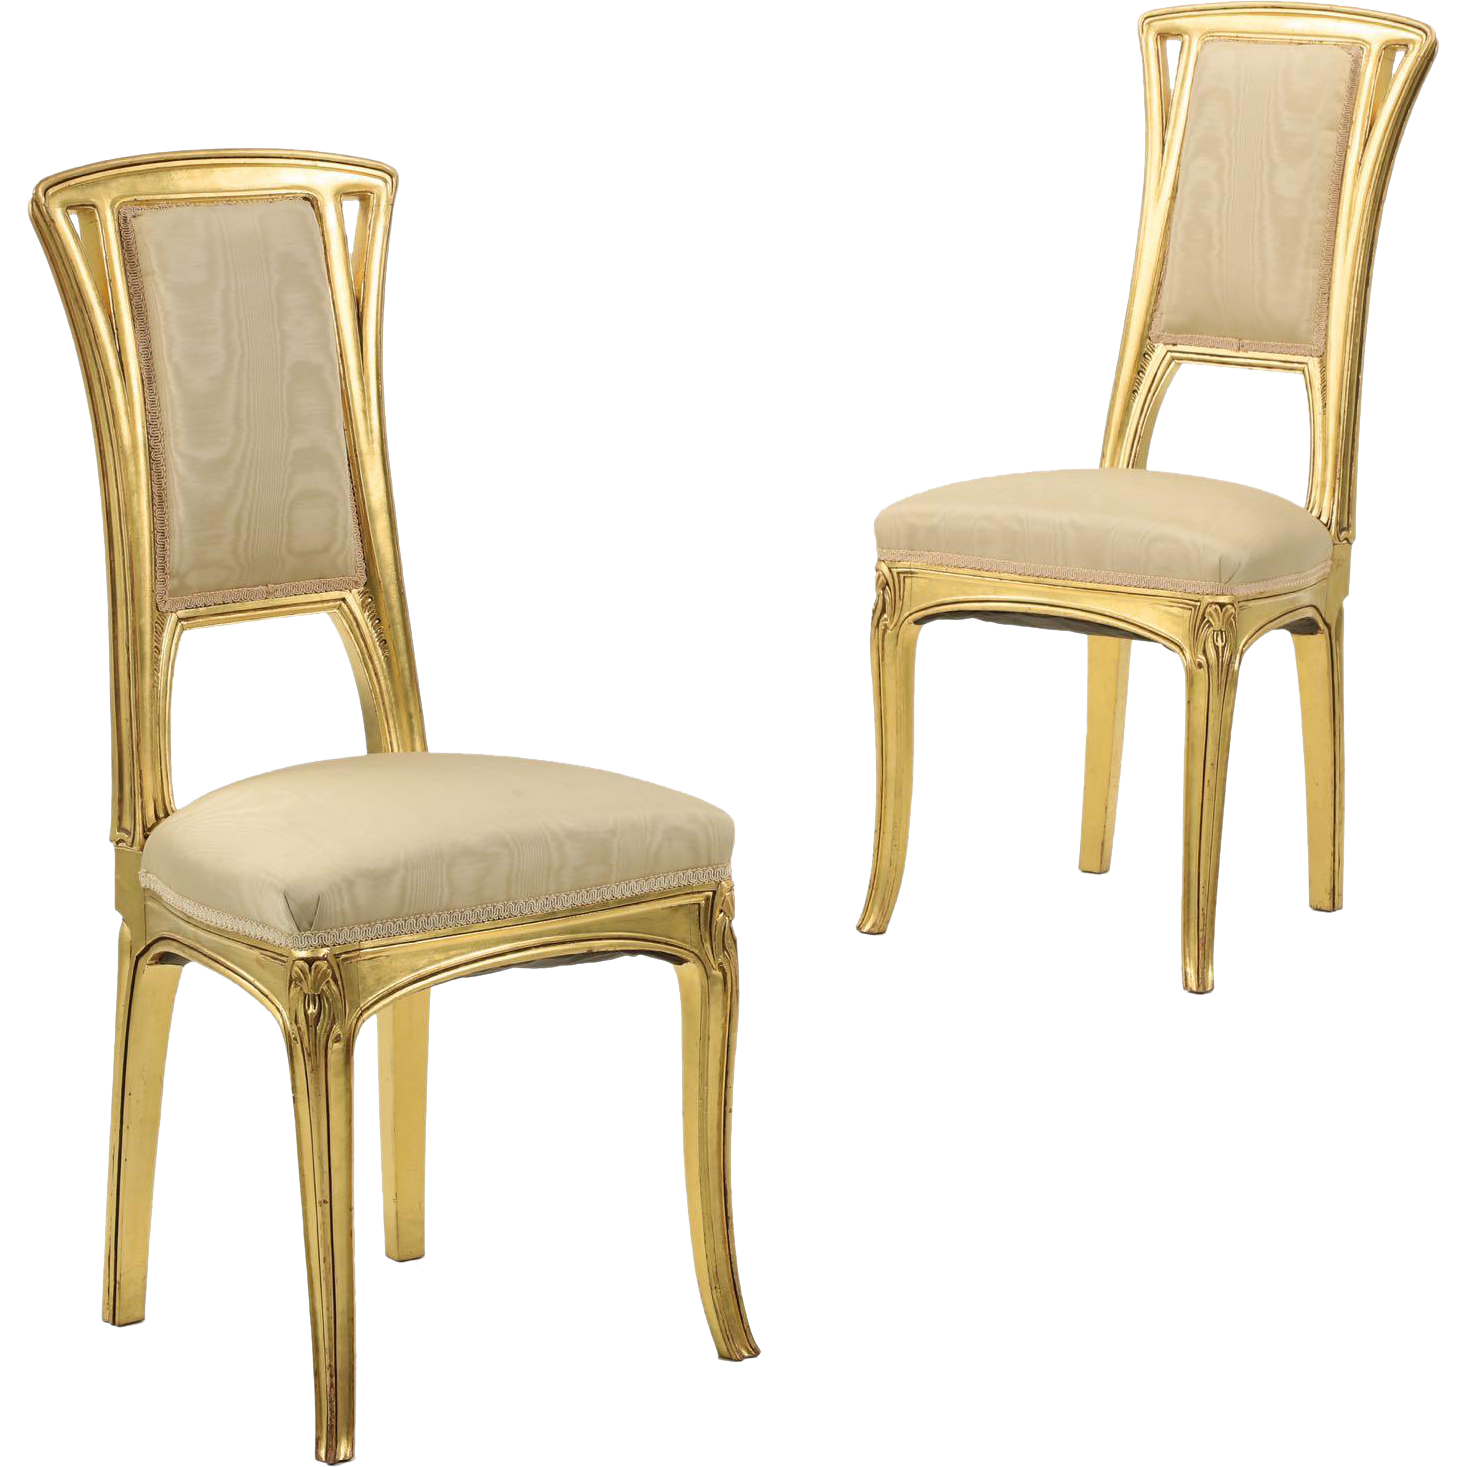 Pair Of Art Nouveau Giltwood Antique Side Chairs : Silla, Ltd. | Ruby Lane